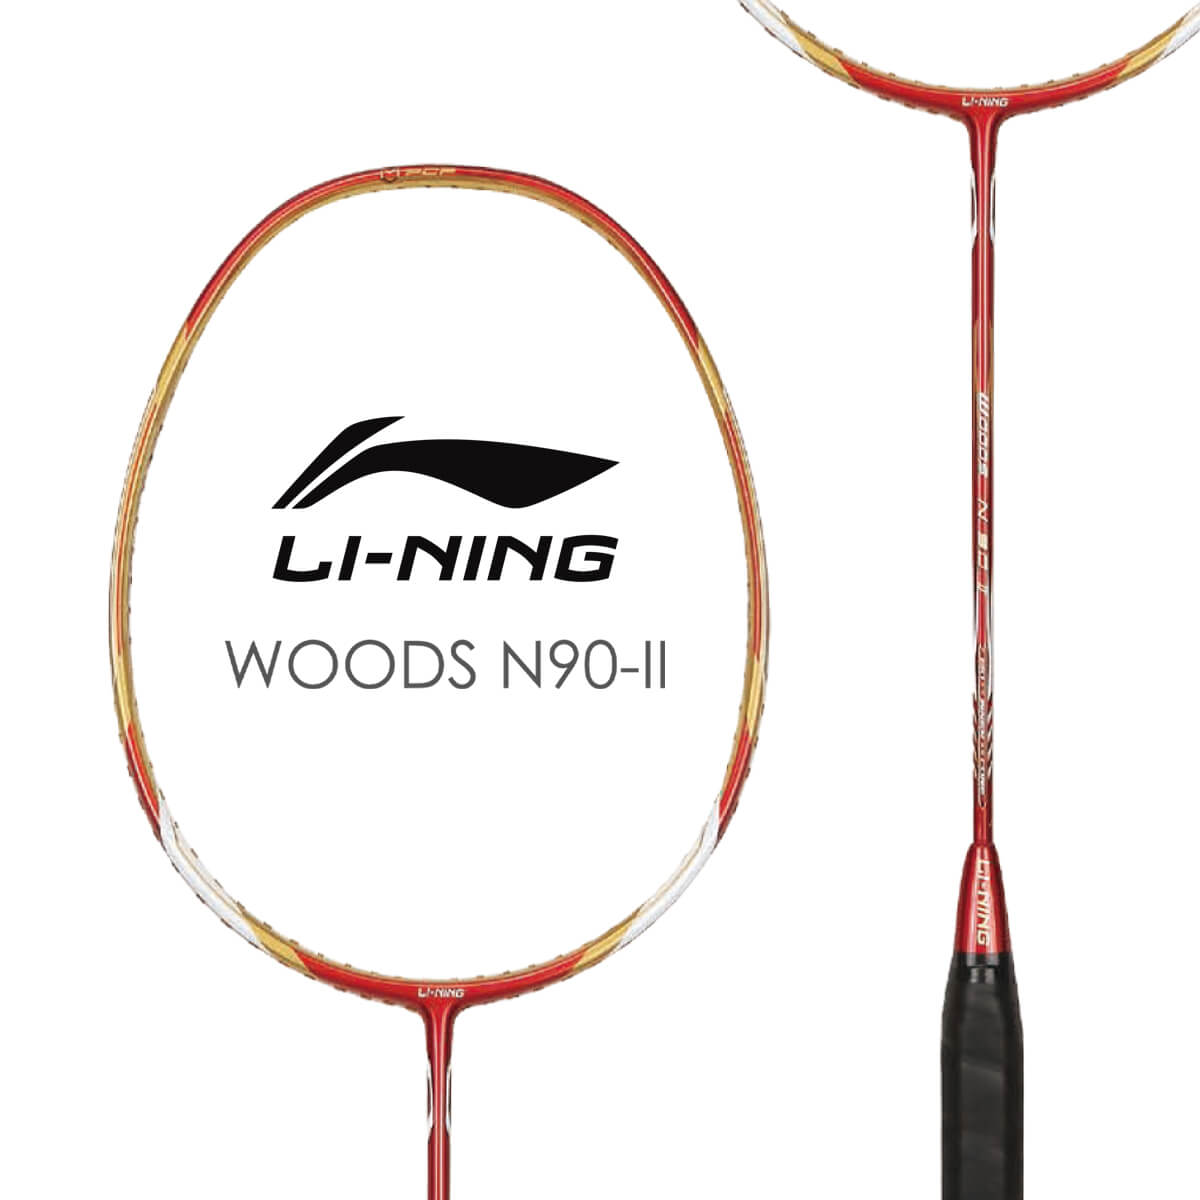 LI-NING Woods N90-II(林丹使用モデル) AYPE016-1 バドミントンラケット リーニン【オススメガット&ガット張り工賃無料】